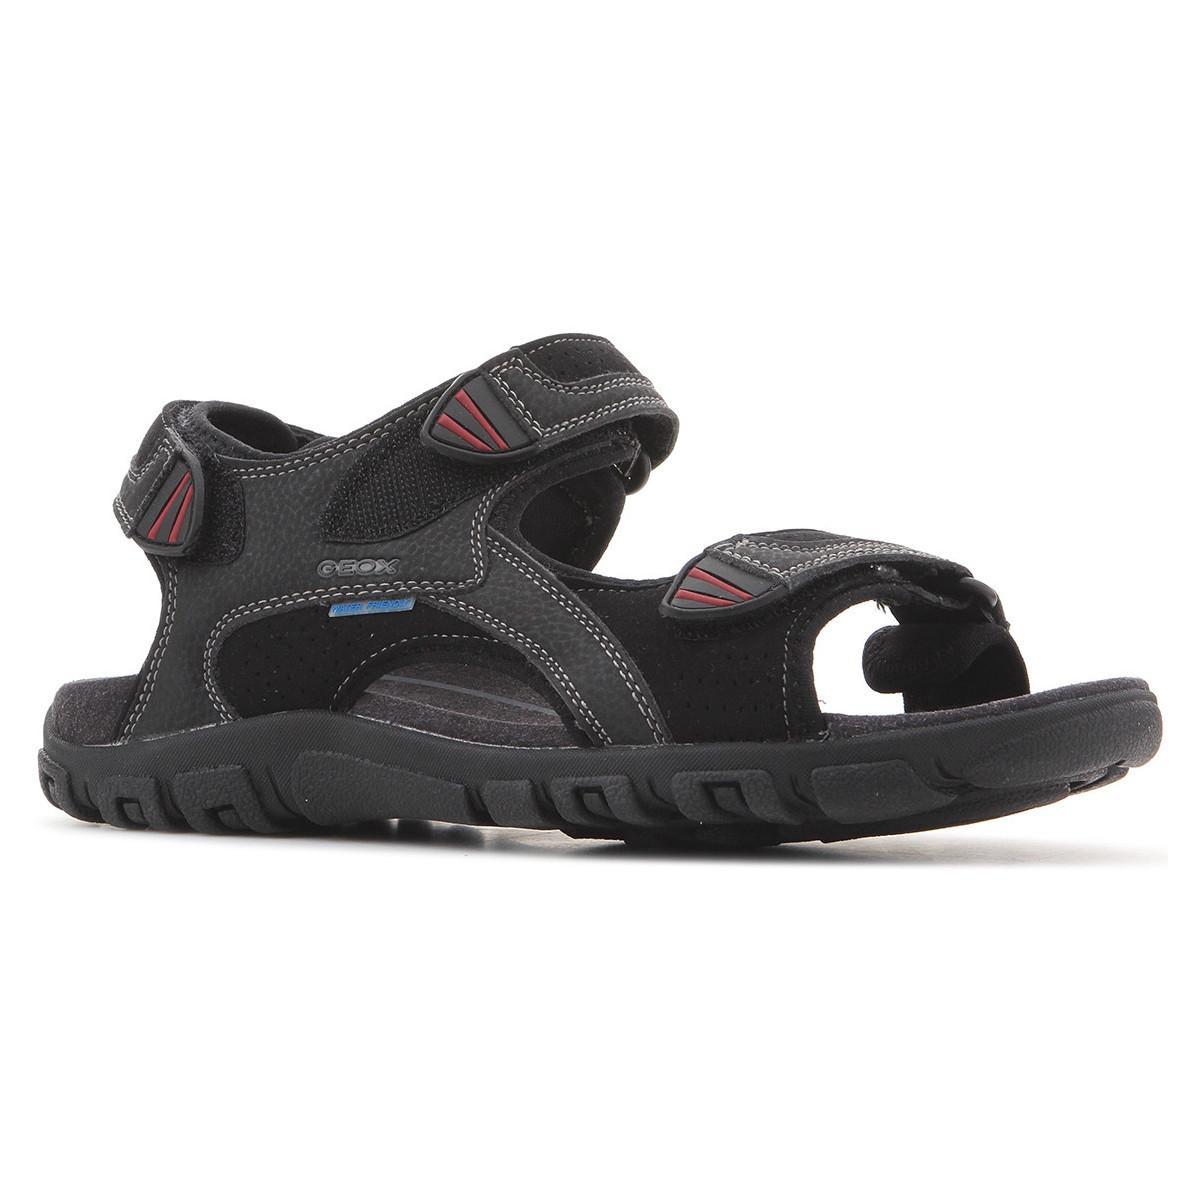 Geox U S. Strada Wf C U6224c 0au50 C9999 Men's Sandals In